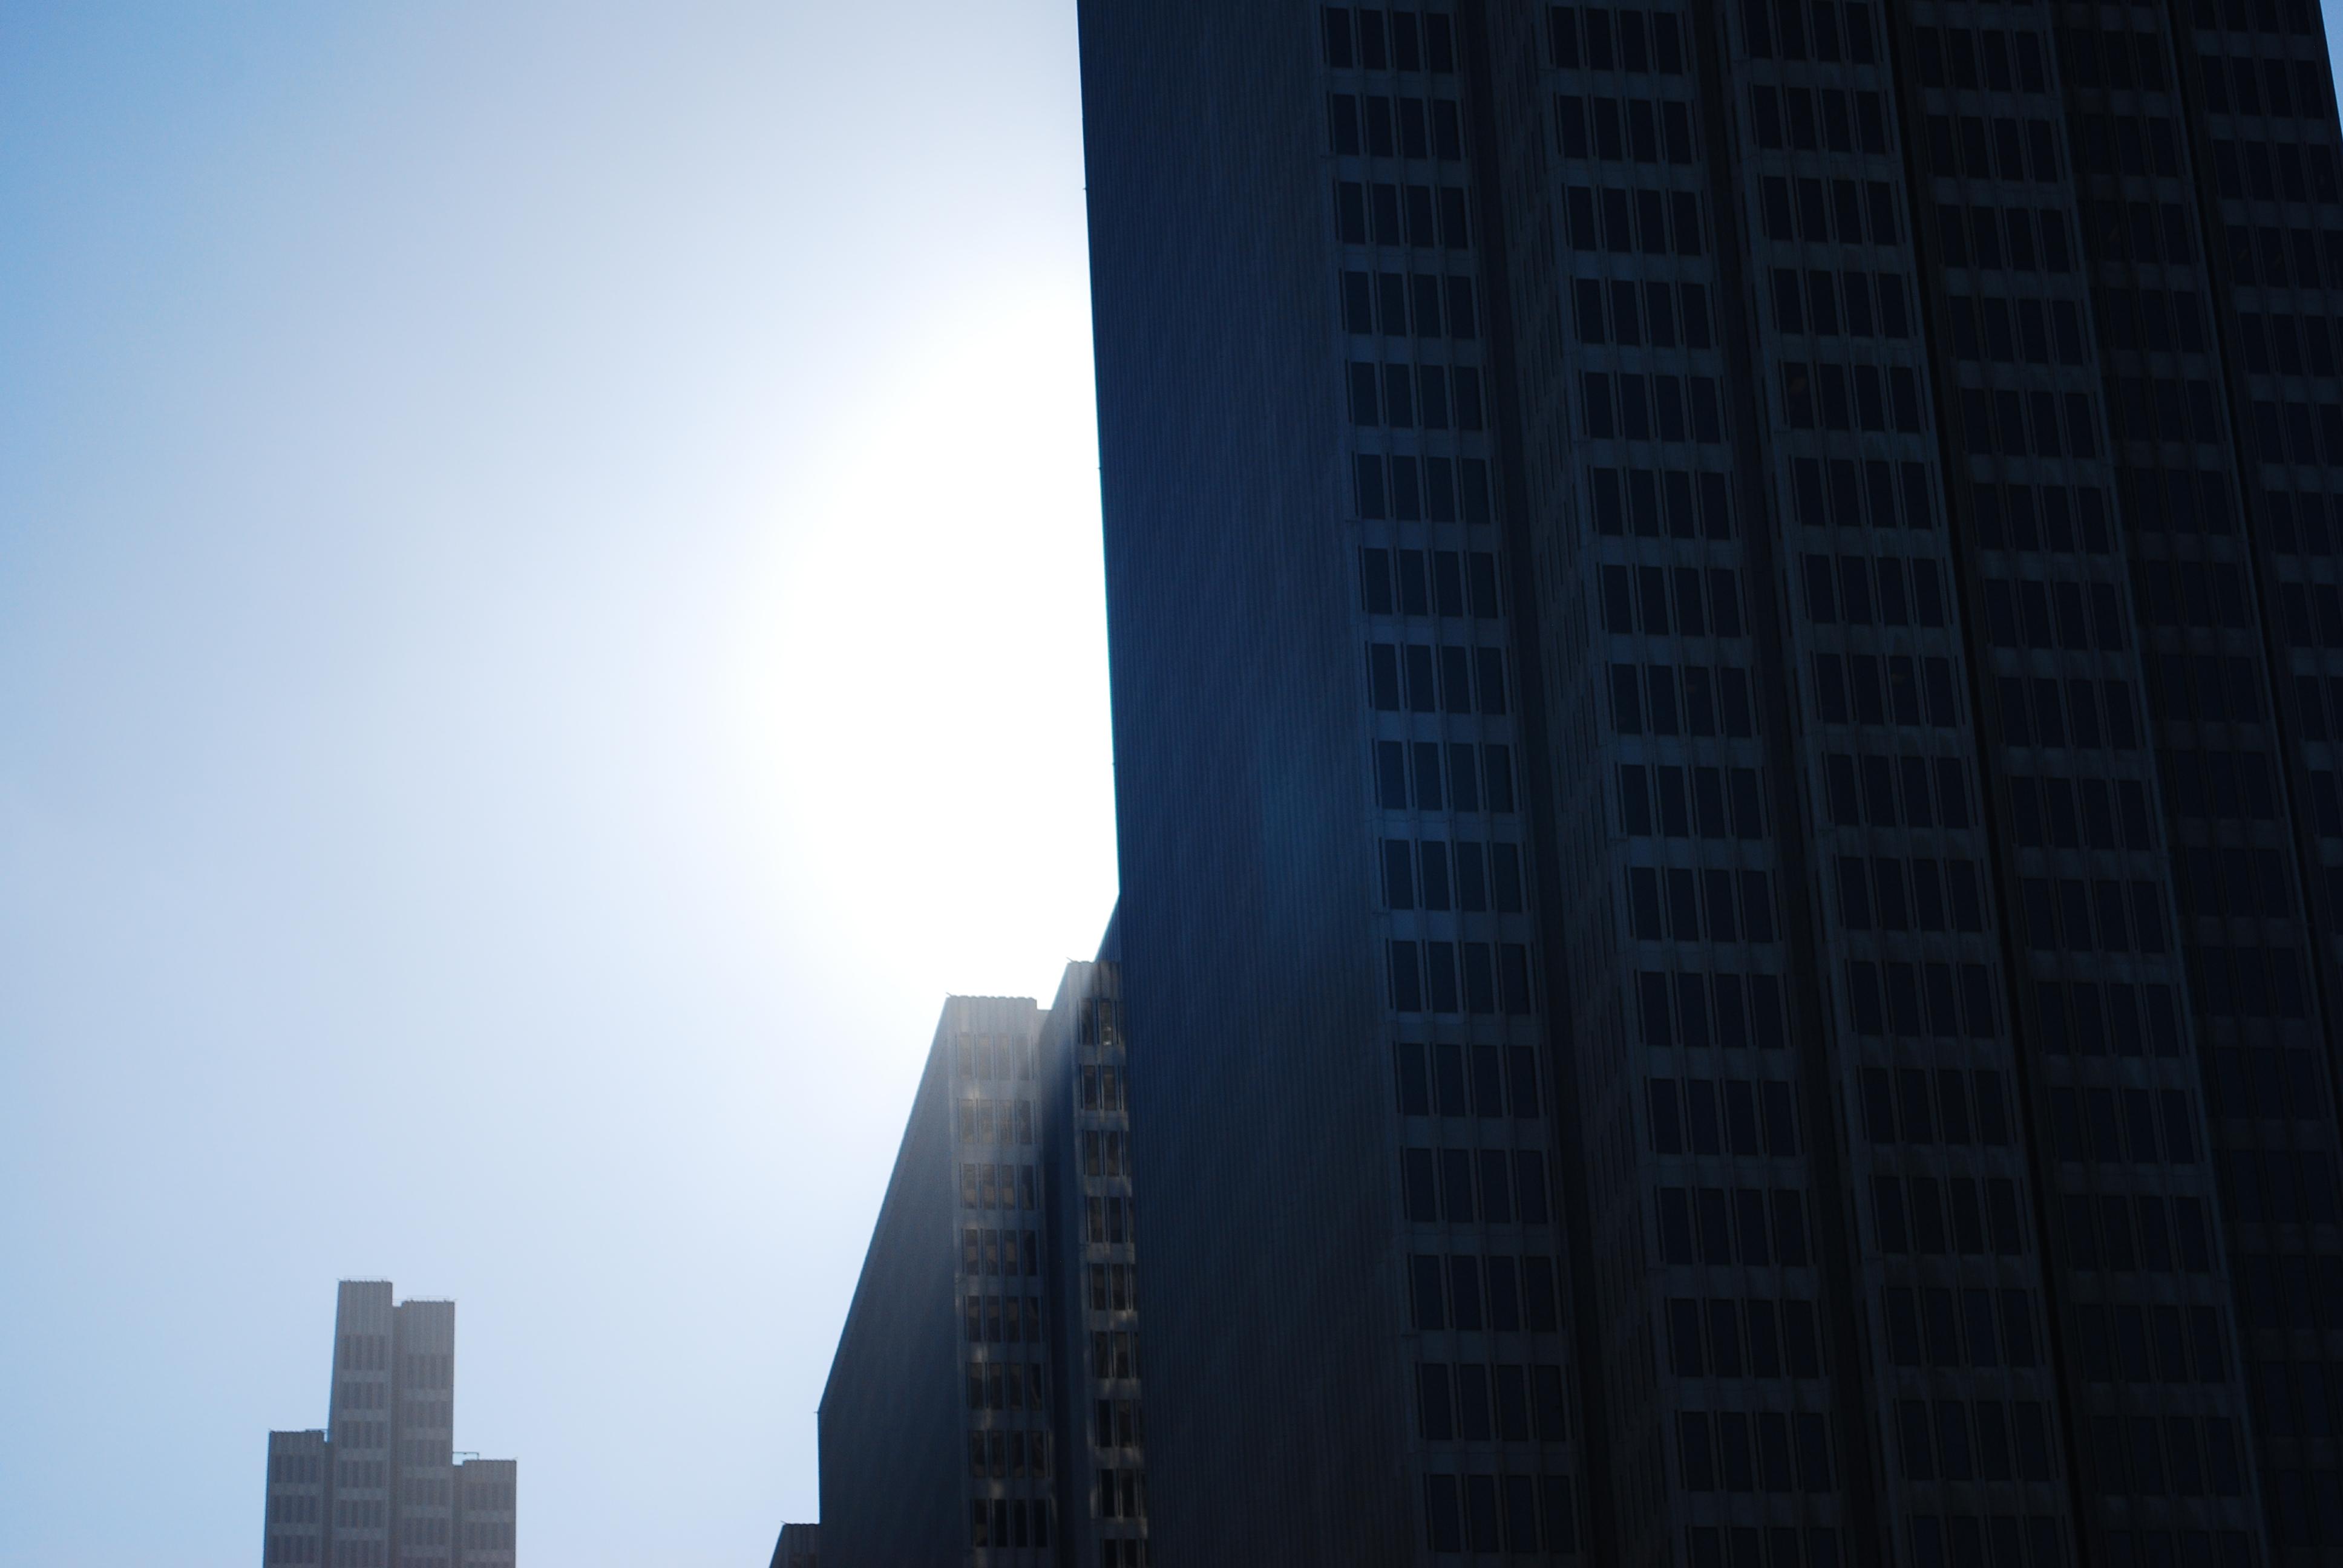 San Francisco, 2010